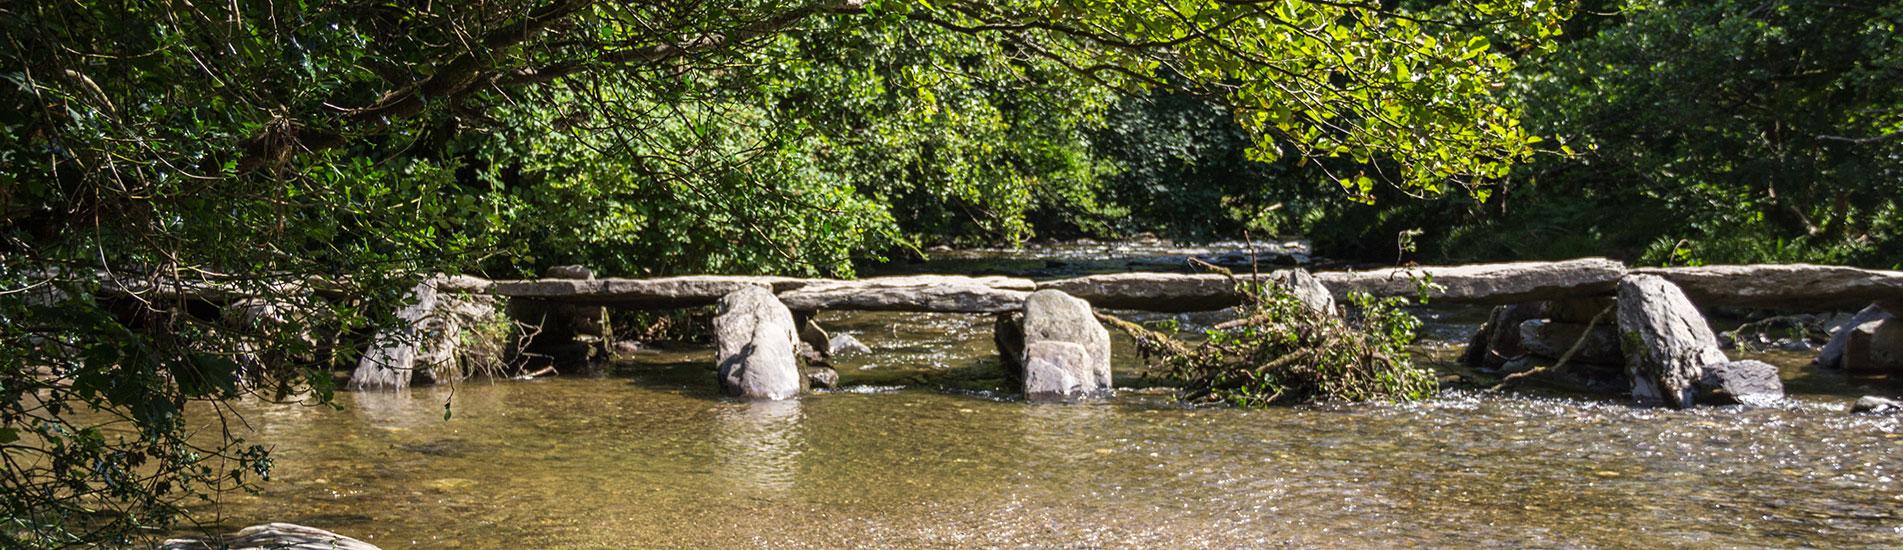 Tarr Steps, Exmoor